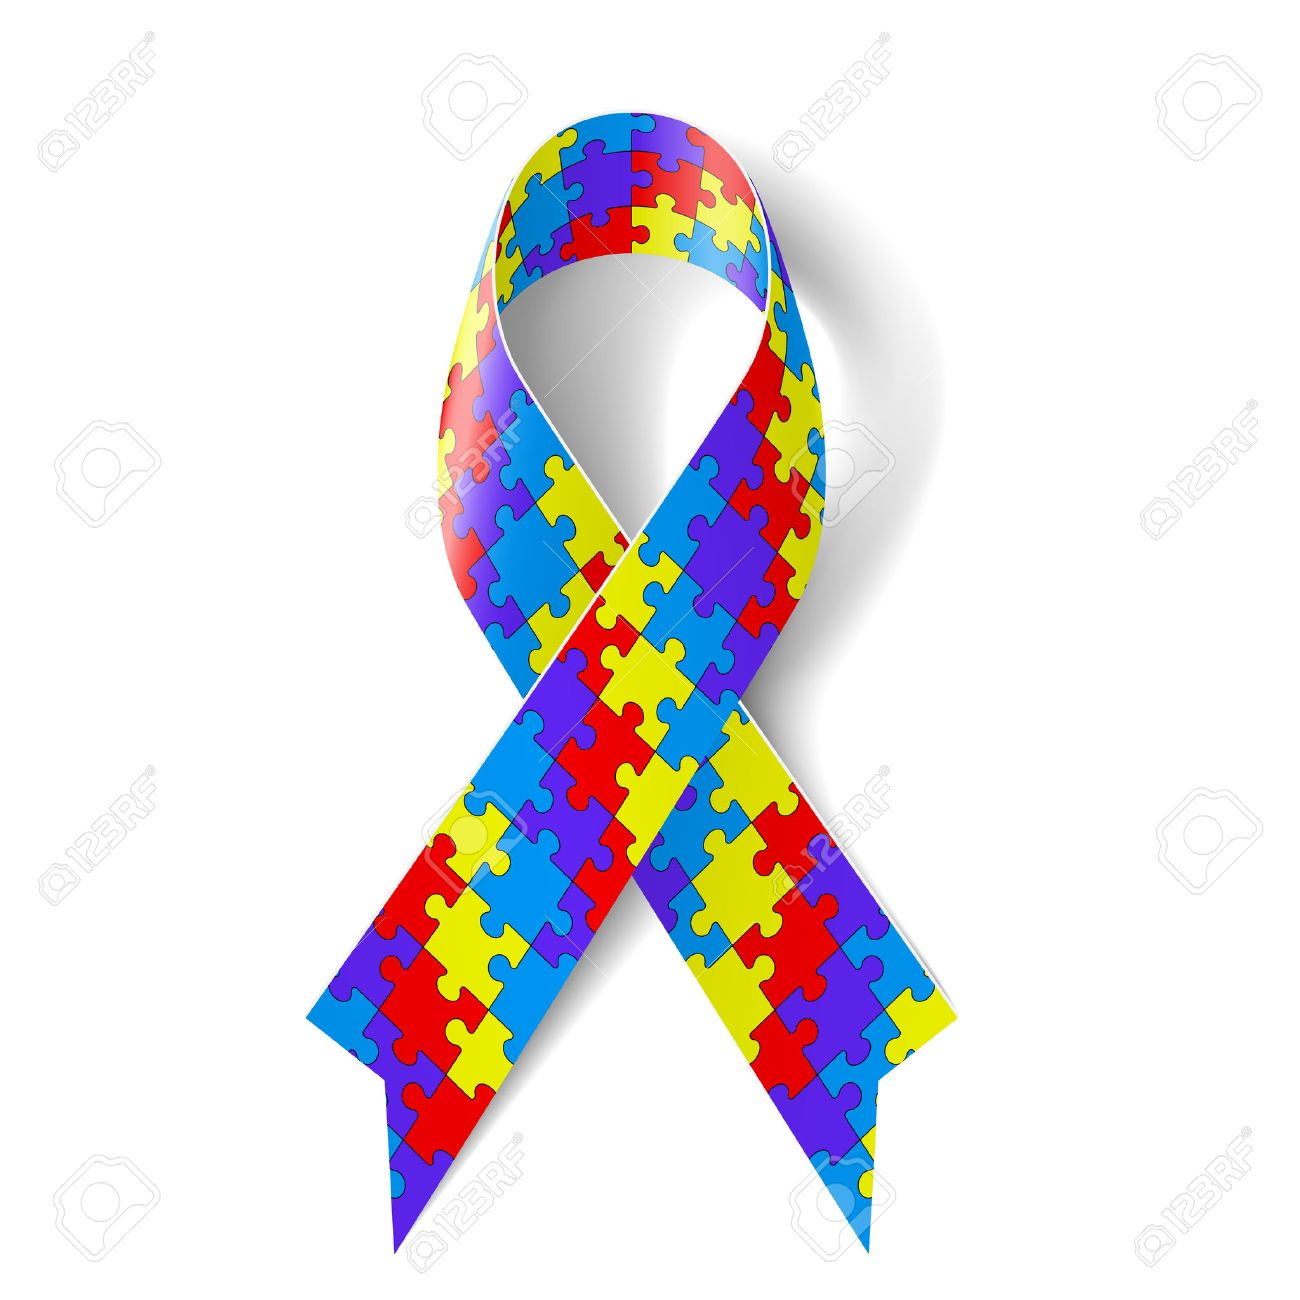 Colorful puzzle ribbon as symbol autism awareness.